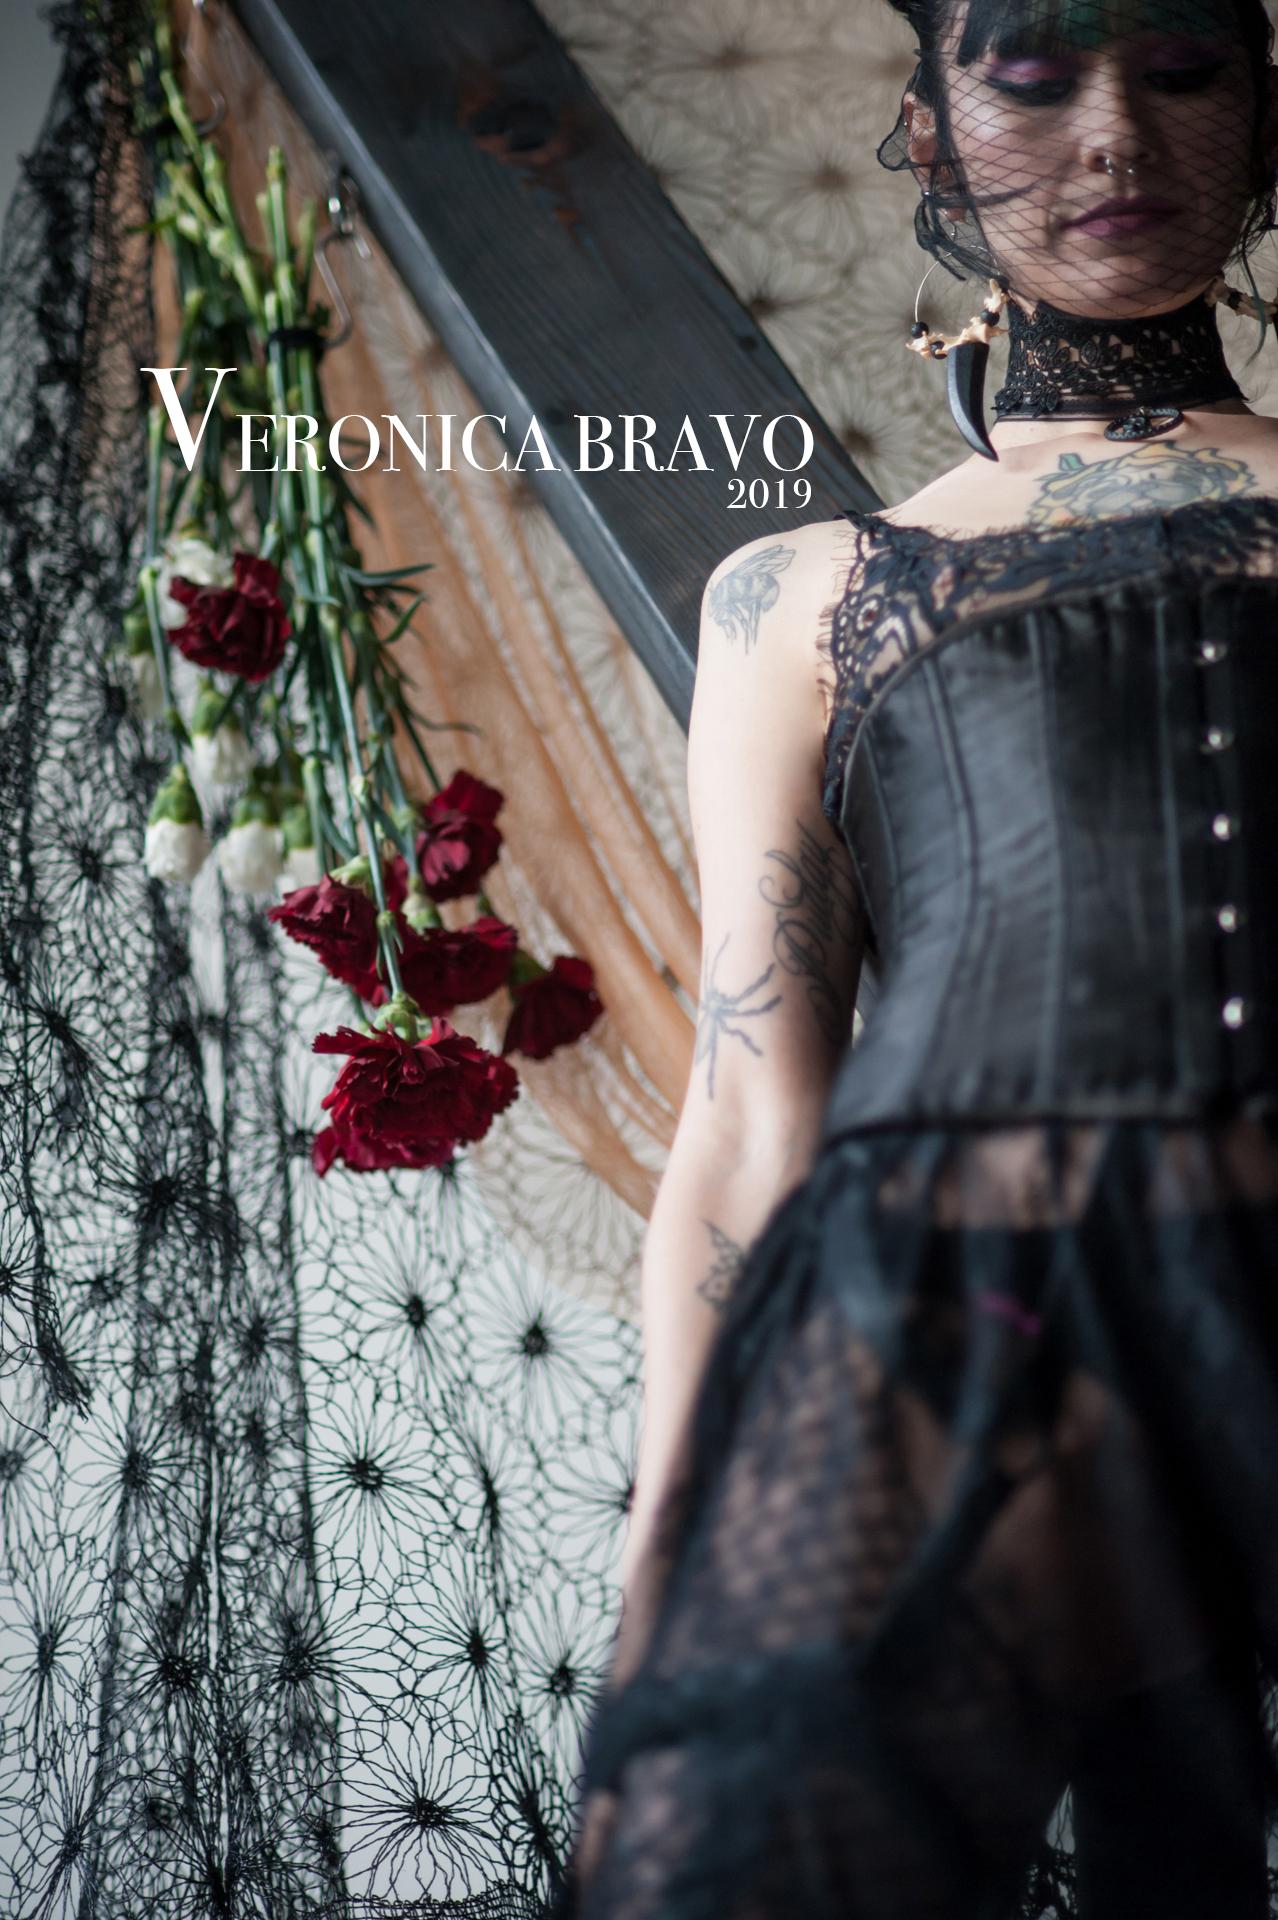 VeronicaBravoX-221 2.jpg